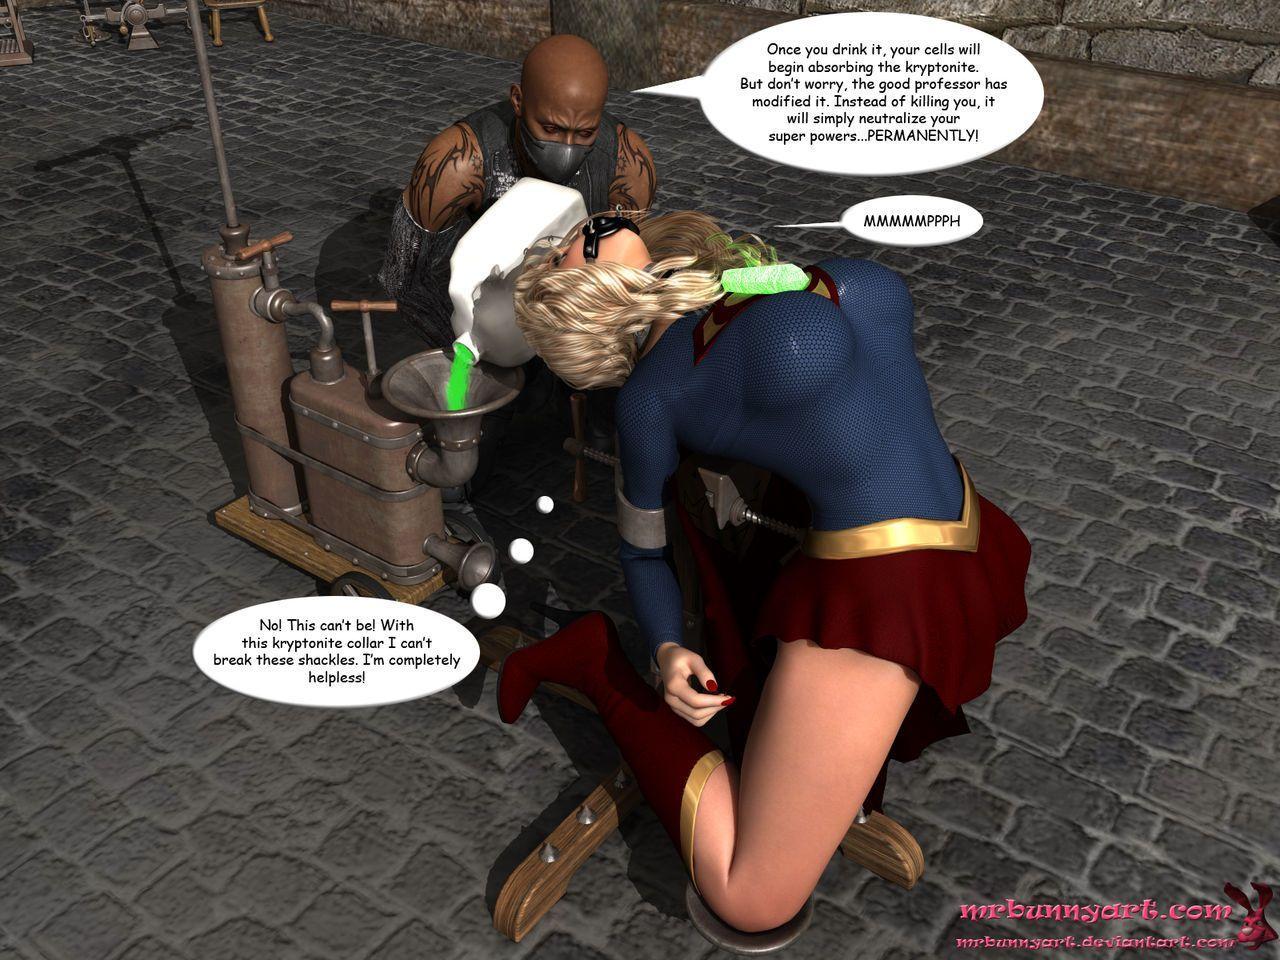 [MrBunnyArt] supergirl vs cain (supergirl) [English] - part 2